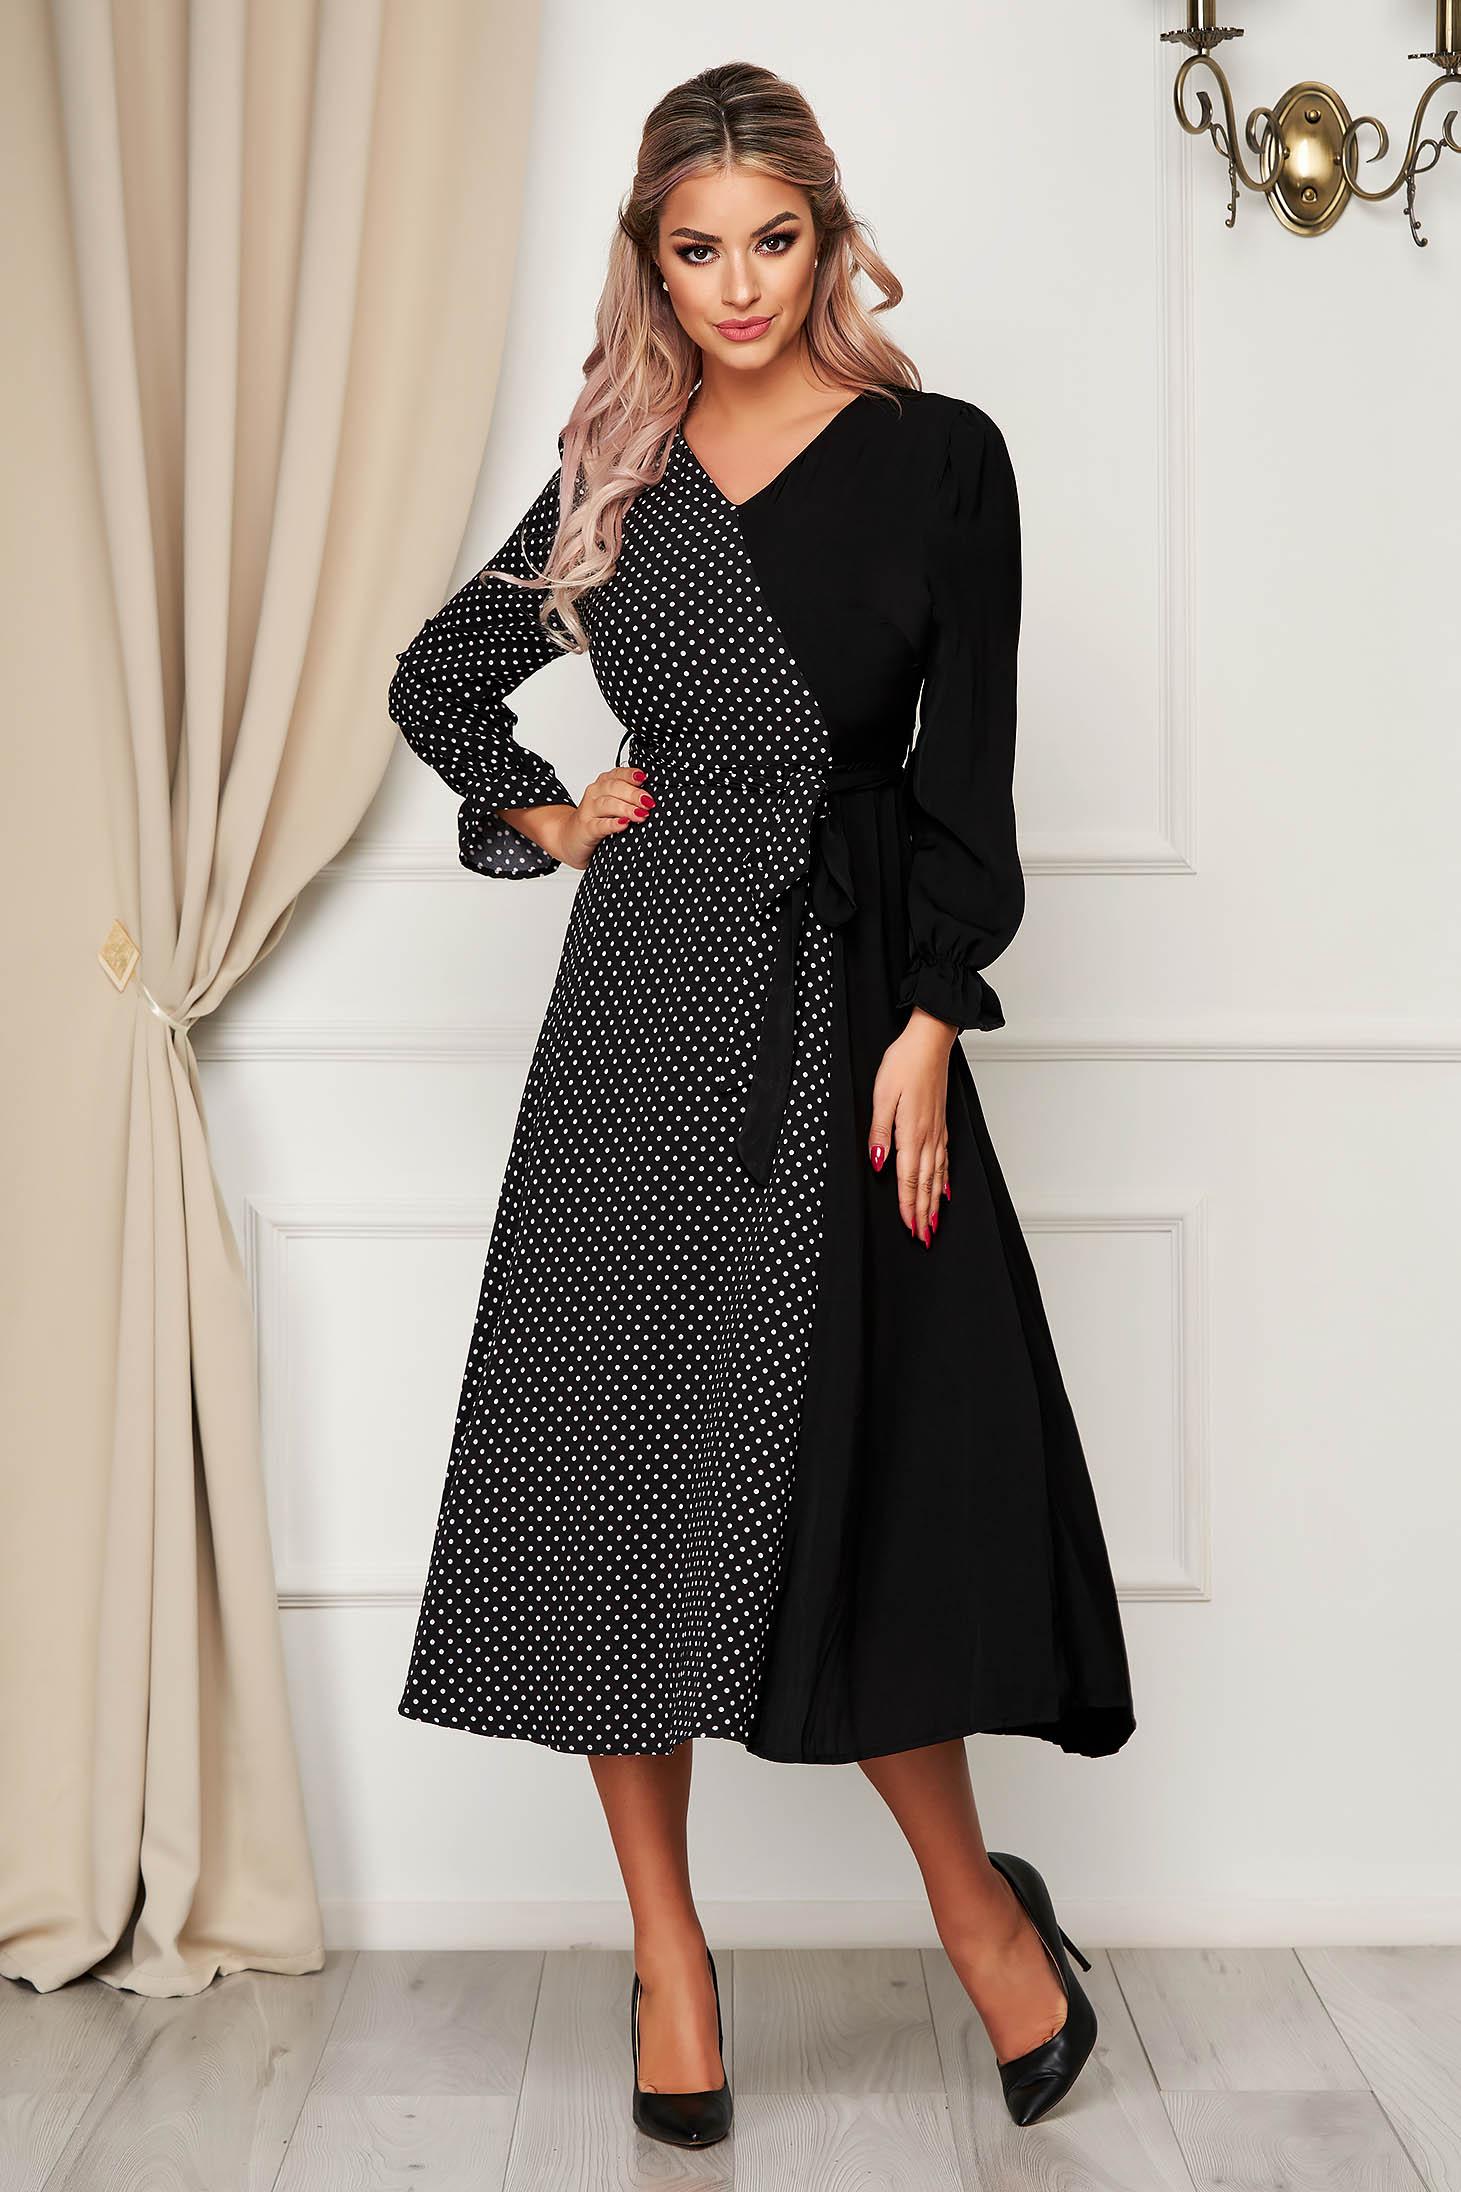 Black dress daily midi cloche with v-neckline accessorized with tied waistband